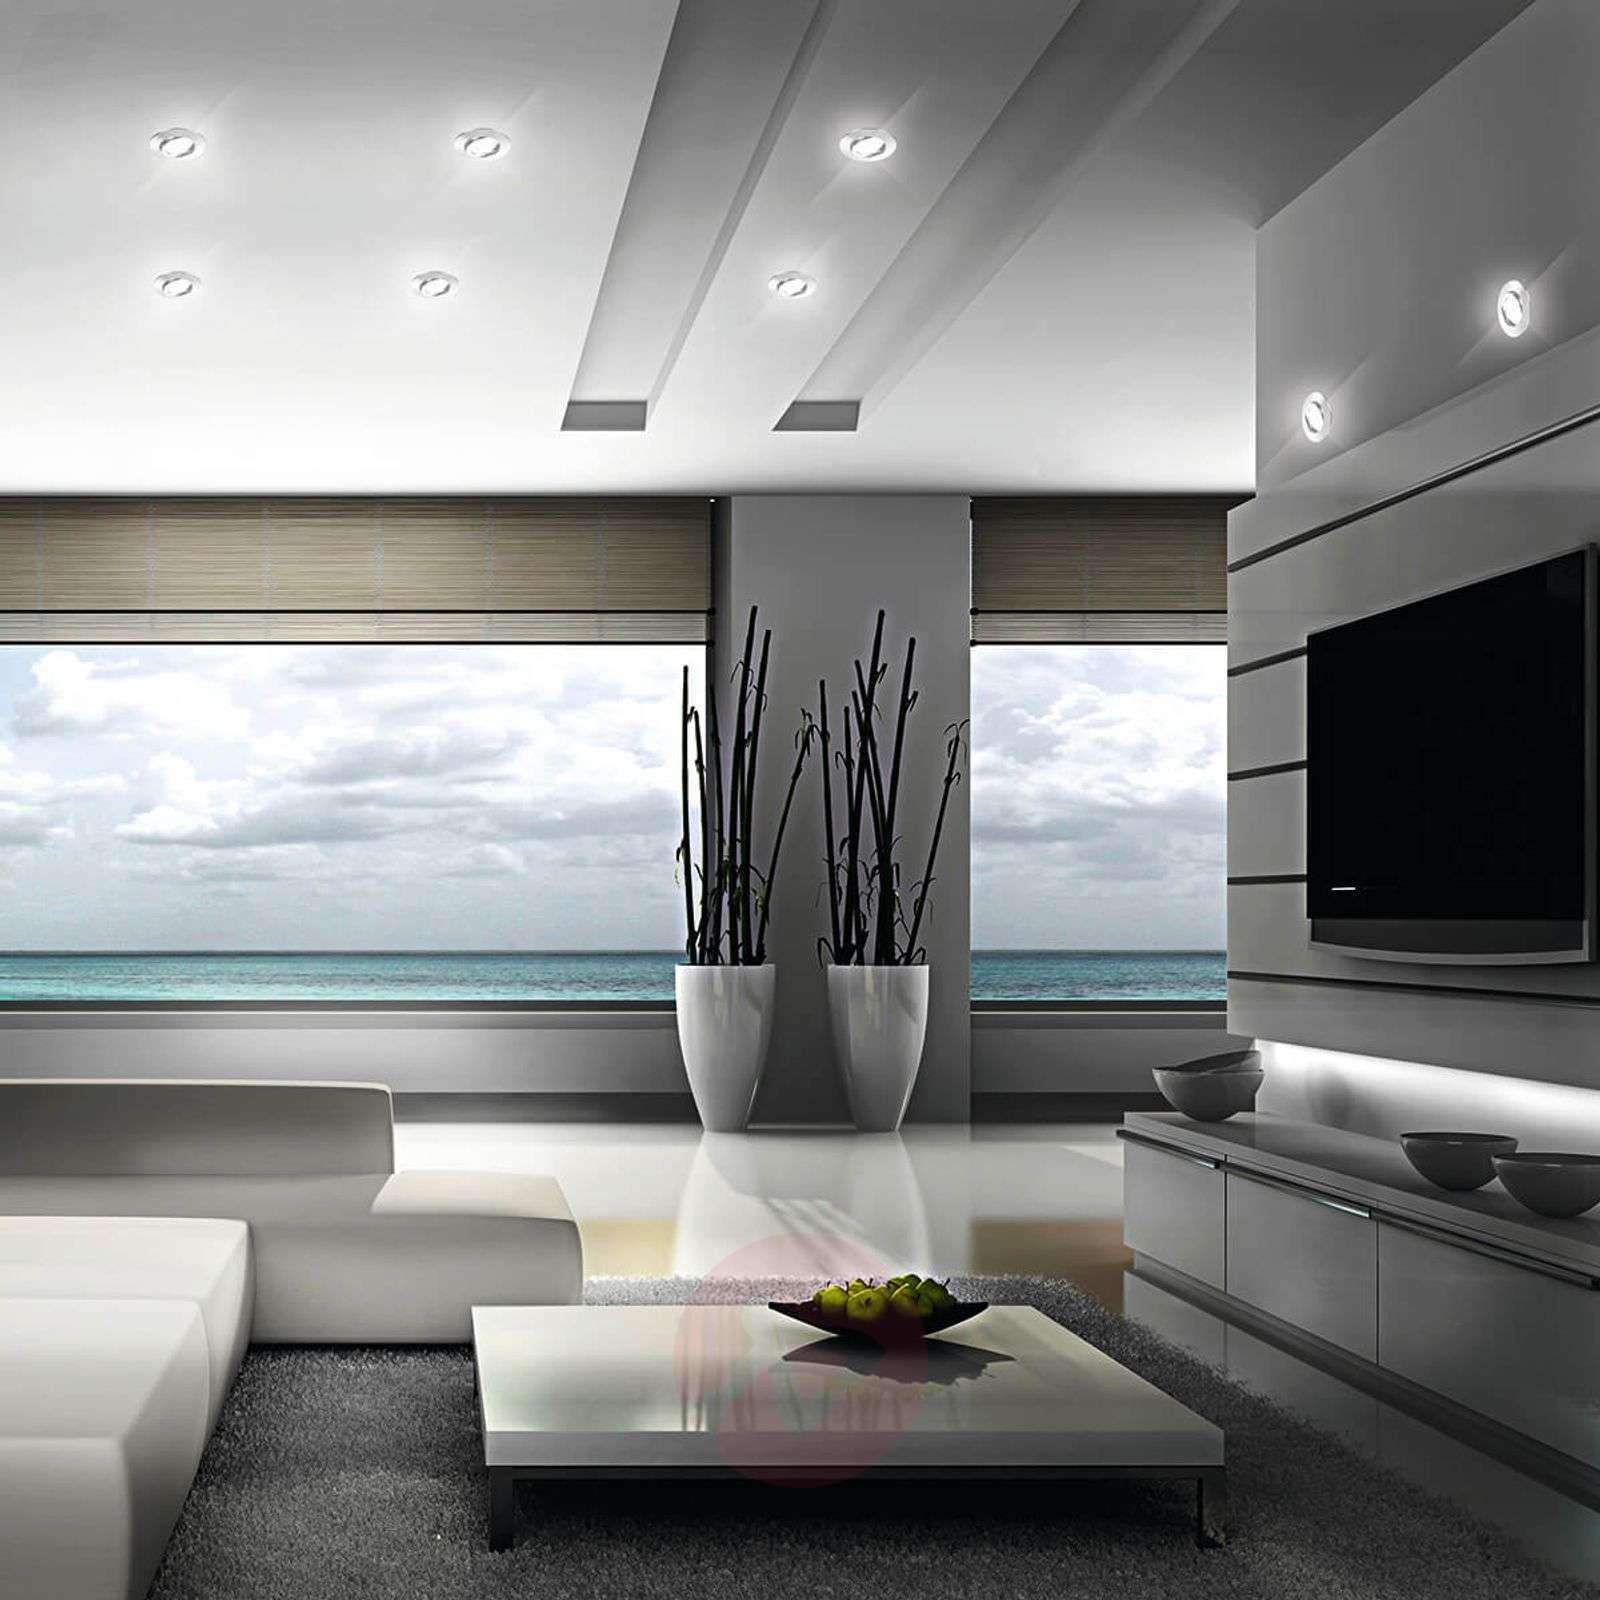 LED recessed ceiling spotlight Zenit chrome-3006558-01